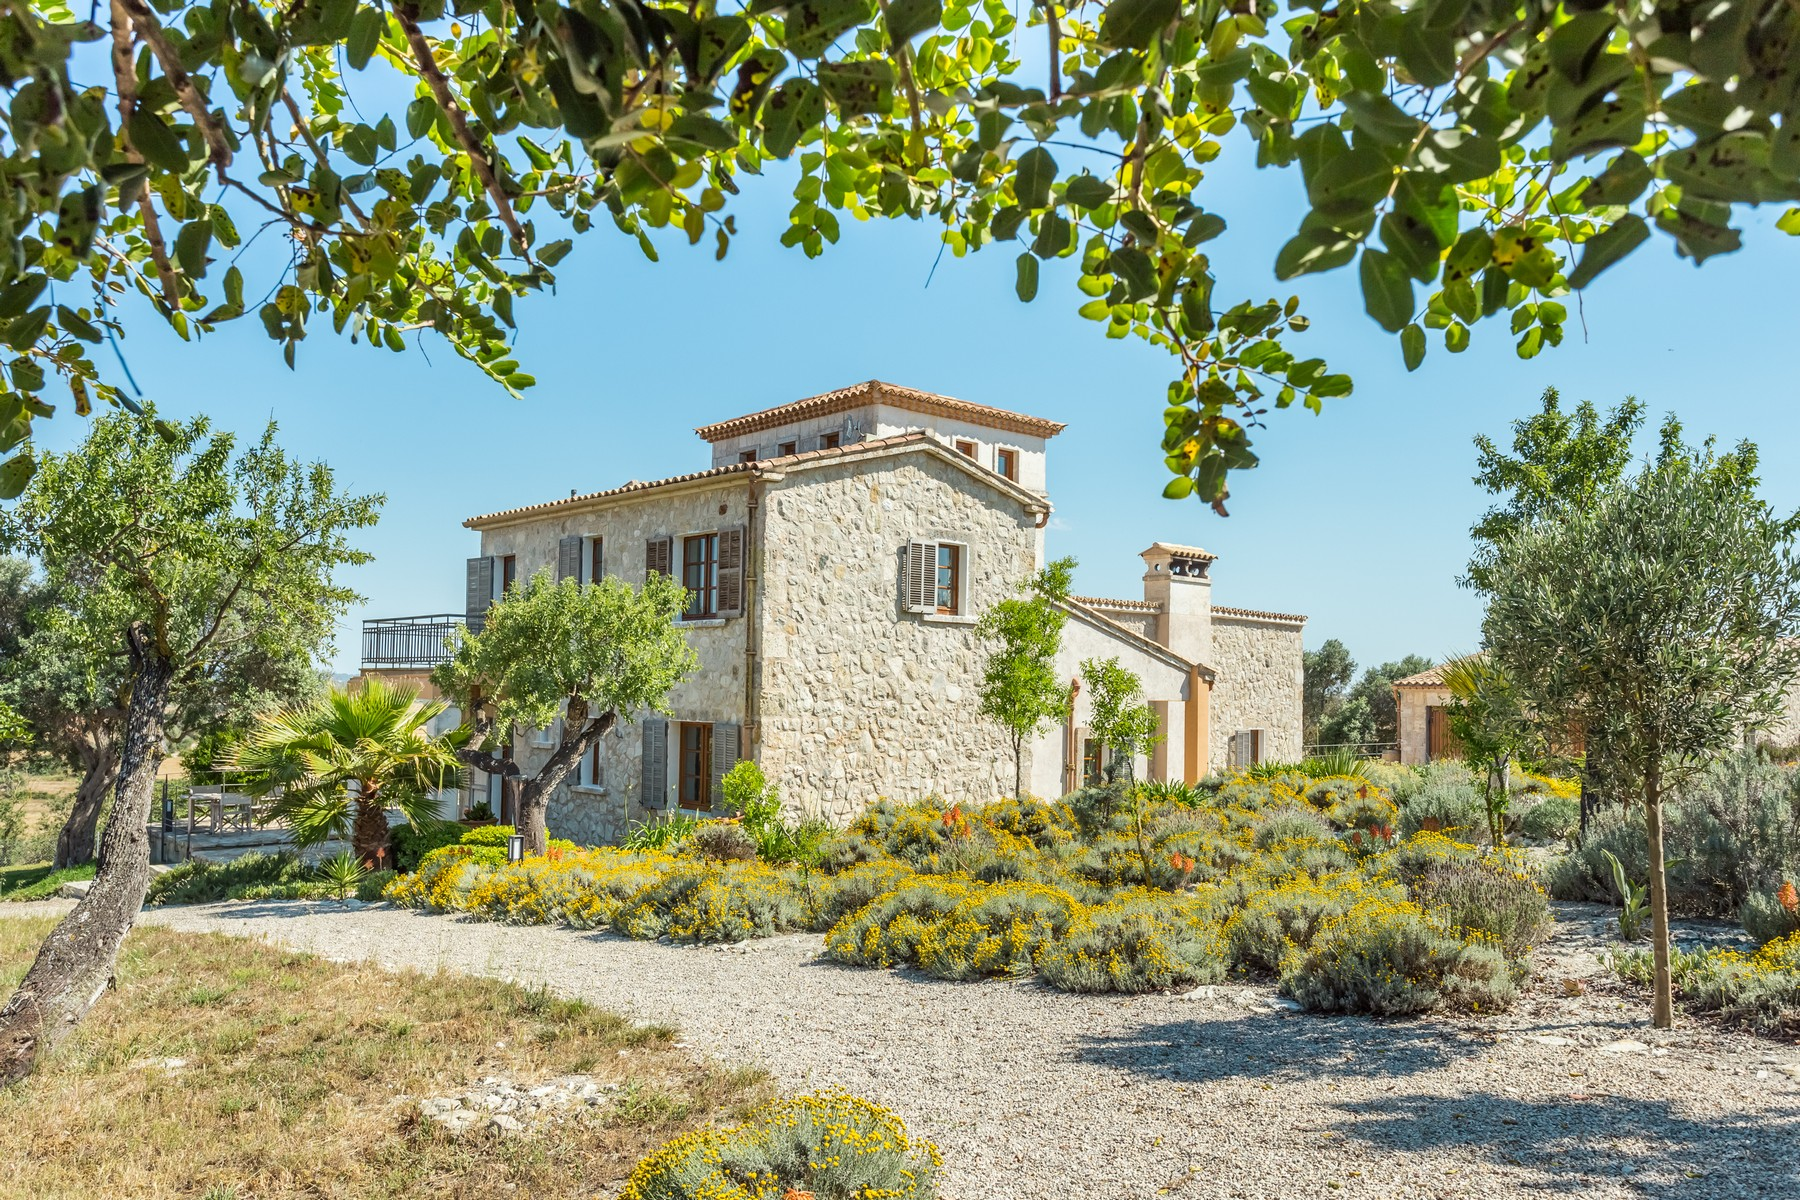 独户住宅 为 销售 在 Mallorcan country estate next to Alcudia Bay Santa Margalida, 马洛卡, 西班牙